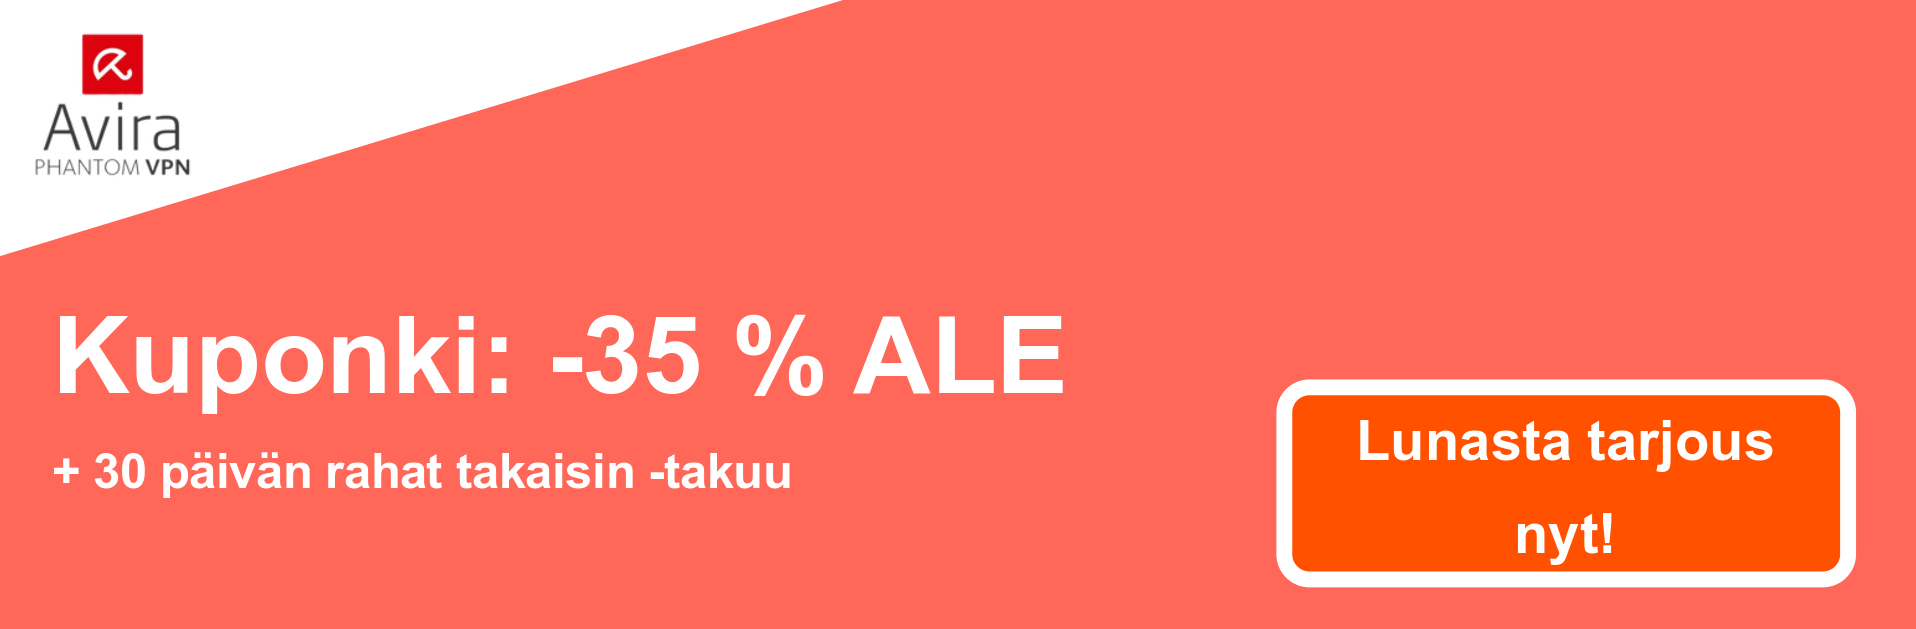 AviraVPN -kupongin banneri - 35% alennus